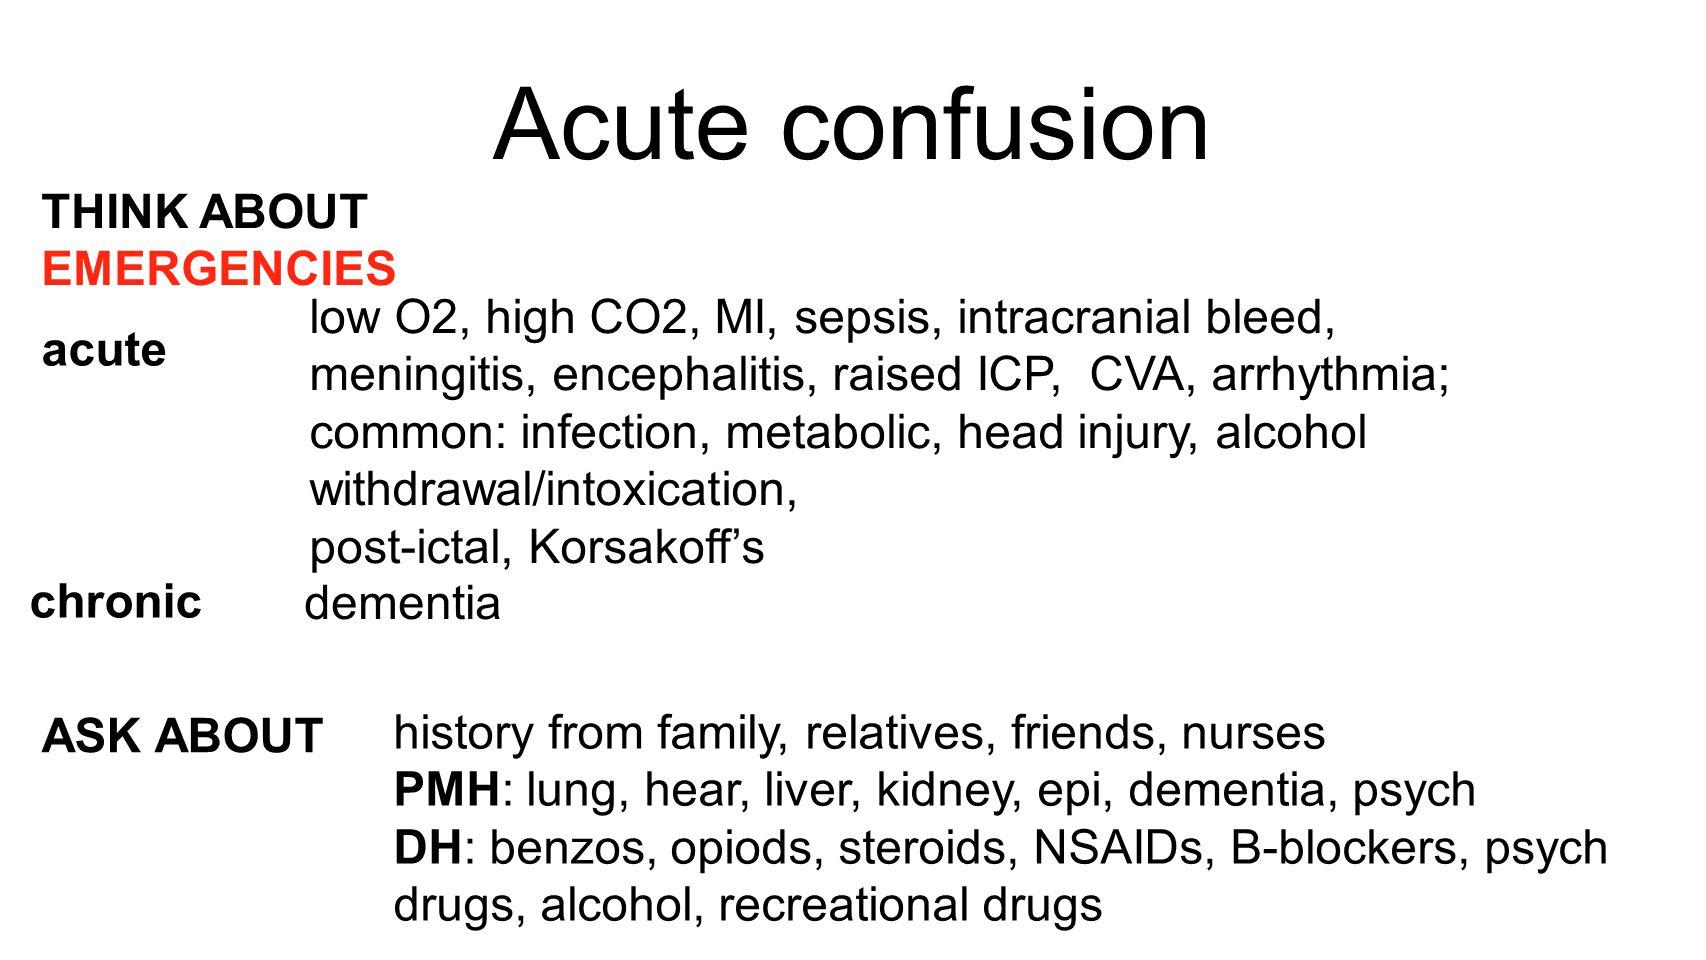 Acute confusion THINK ABOUT EMERGENCIES acute chronic ASK ABOUT low O2, high CO2, MI, sepsis, intracranial bleed, meningitis, encephalitis, raised ICP